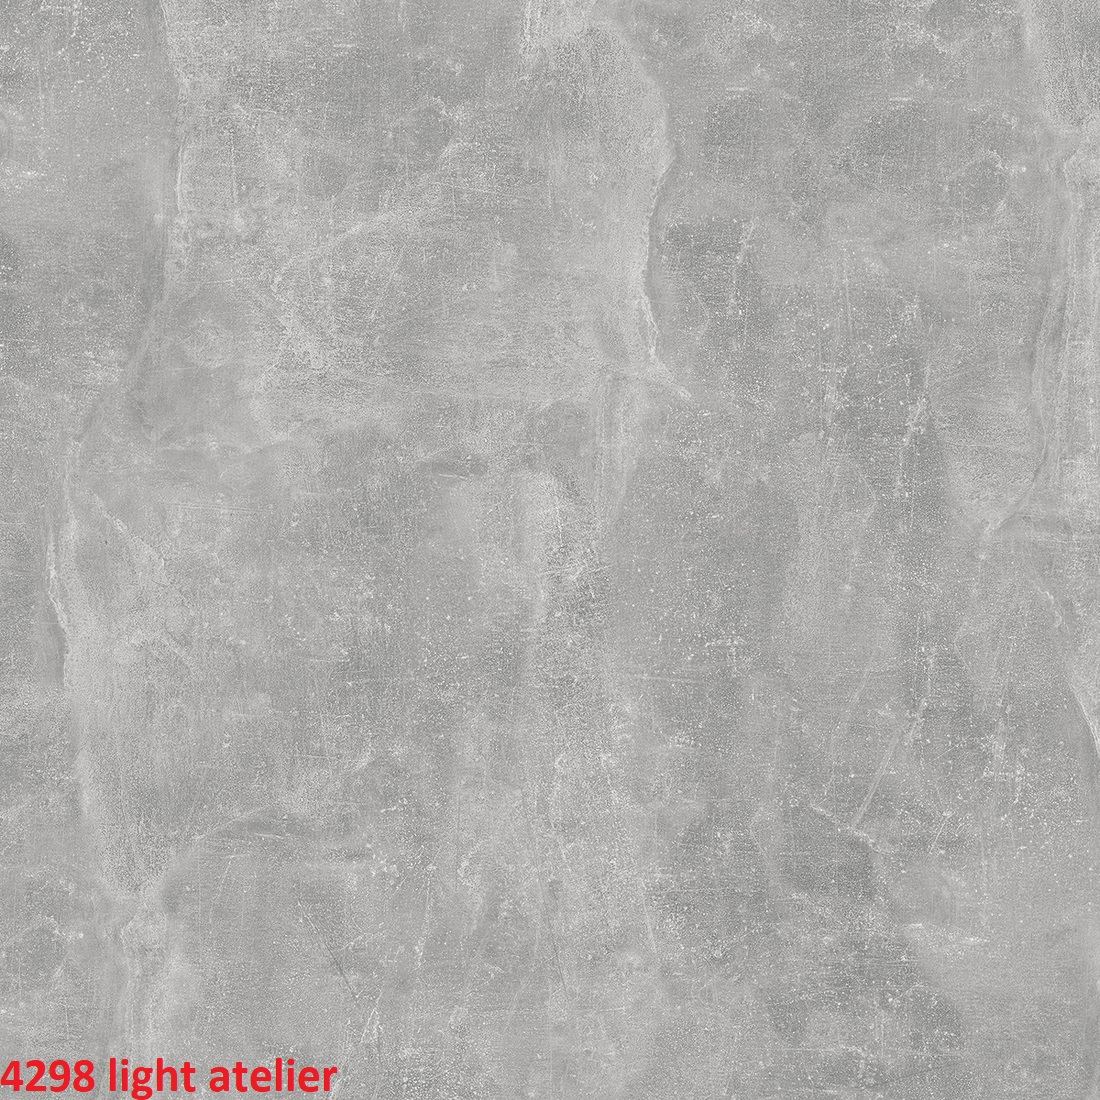 ArtExt Pracovná doska - 38 mm 38 mm: Light Atelier 42 98 UE